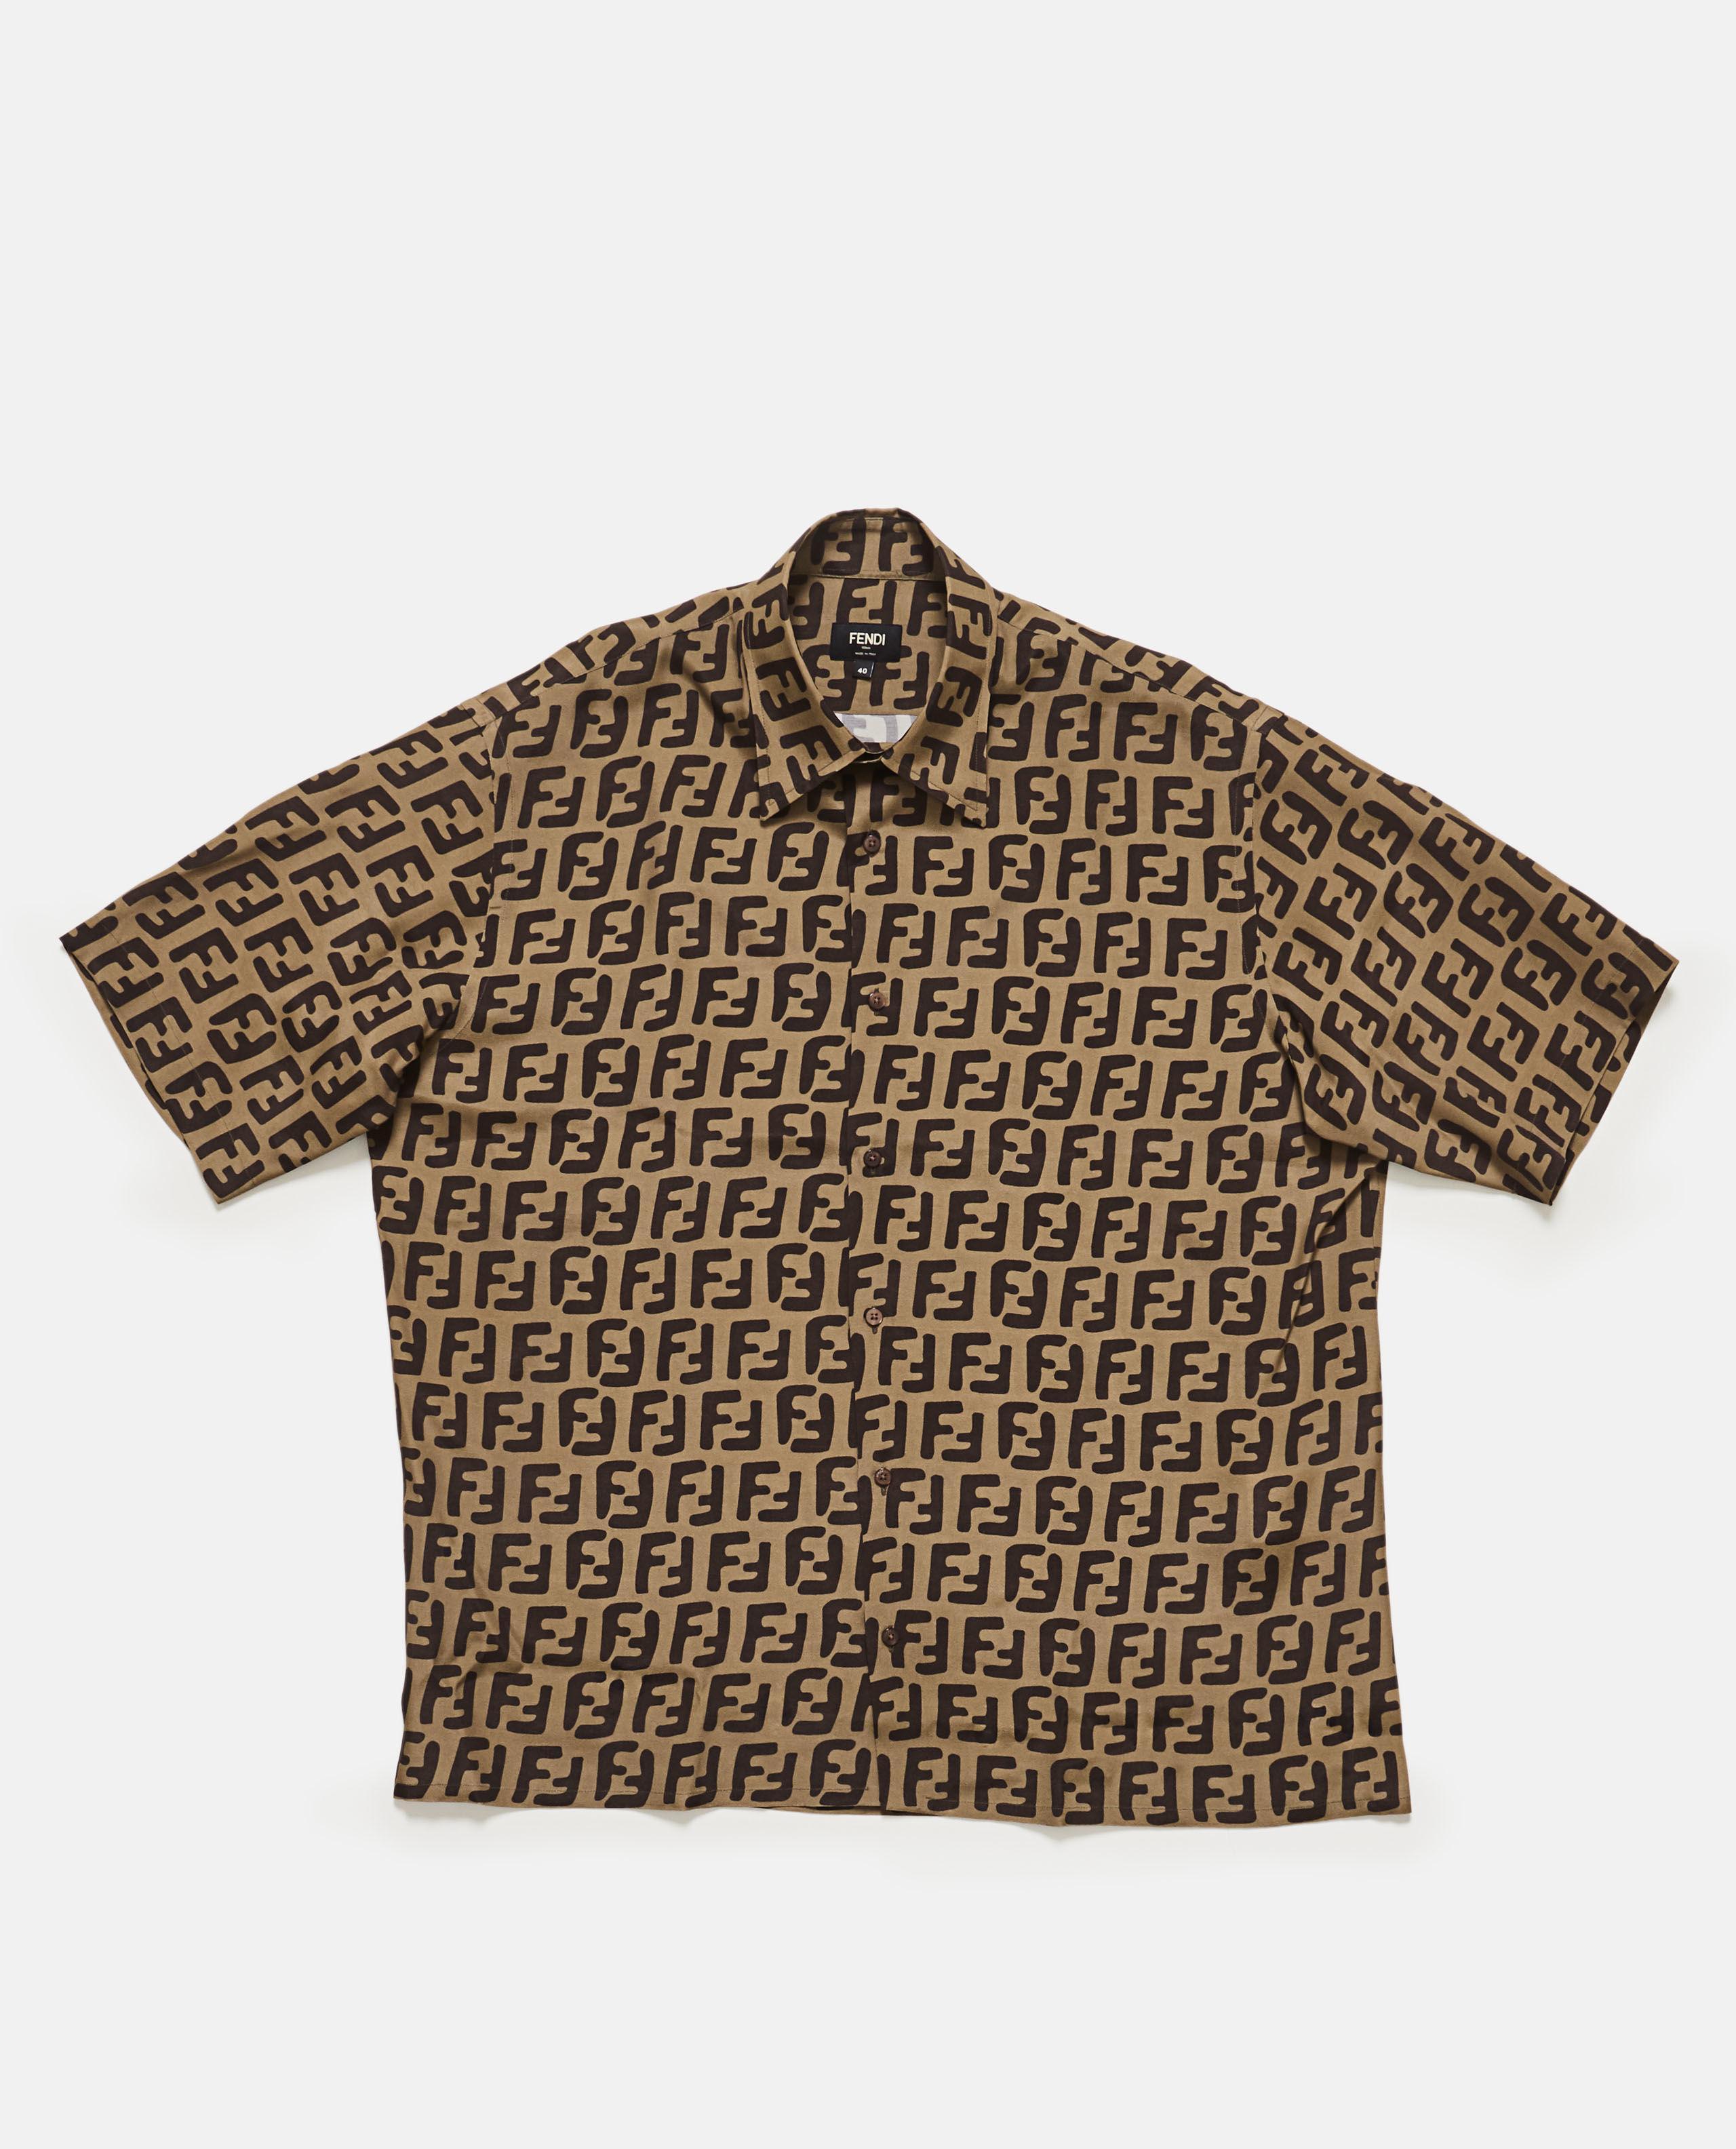 f6822c903894 Lyst - Fendi Ff Pattern Shirt in Brown for Men